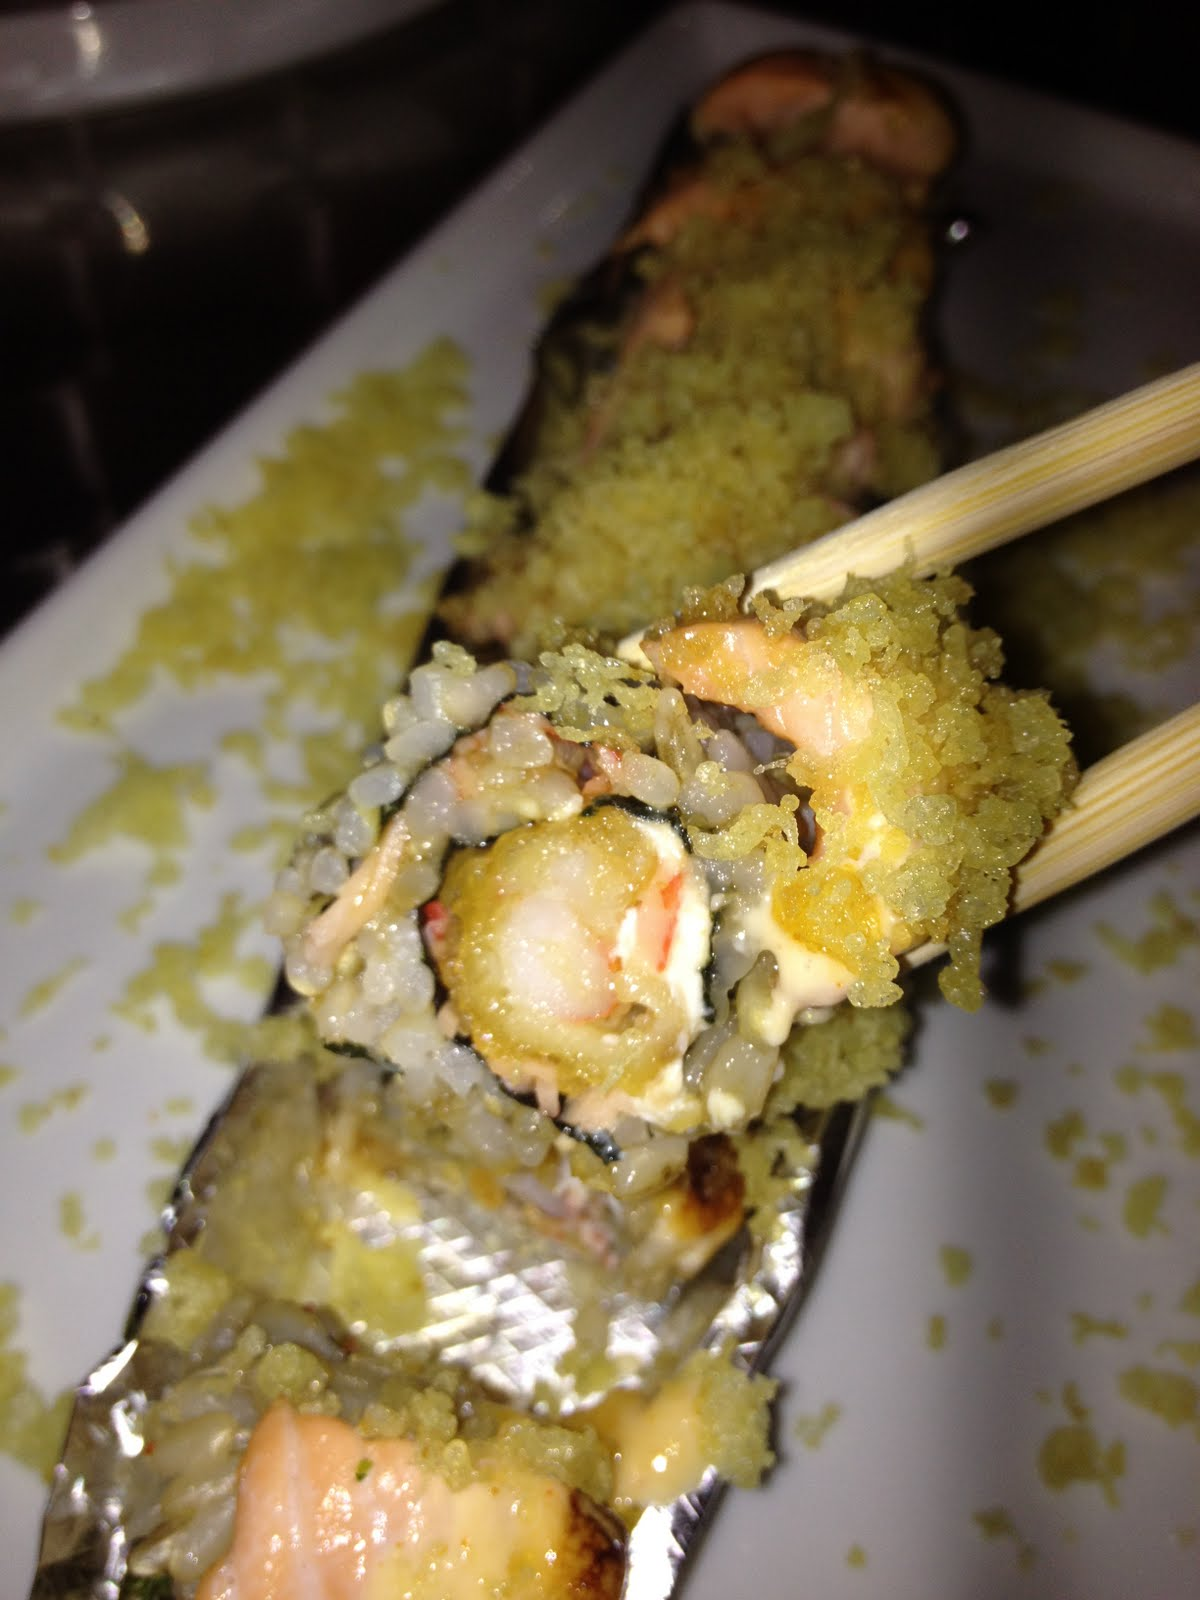 Miami Heat - shrimp tempura, cream cheese, krab salad, topped with ...